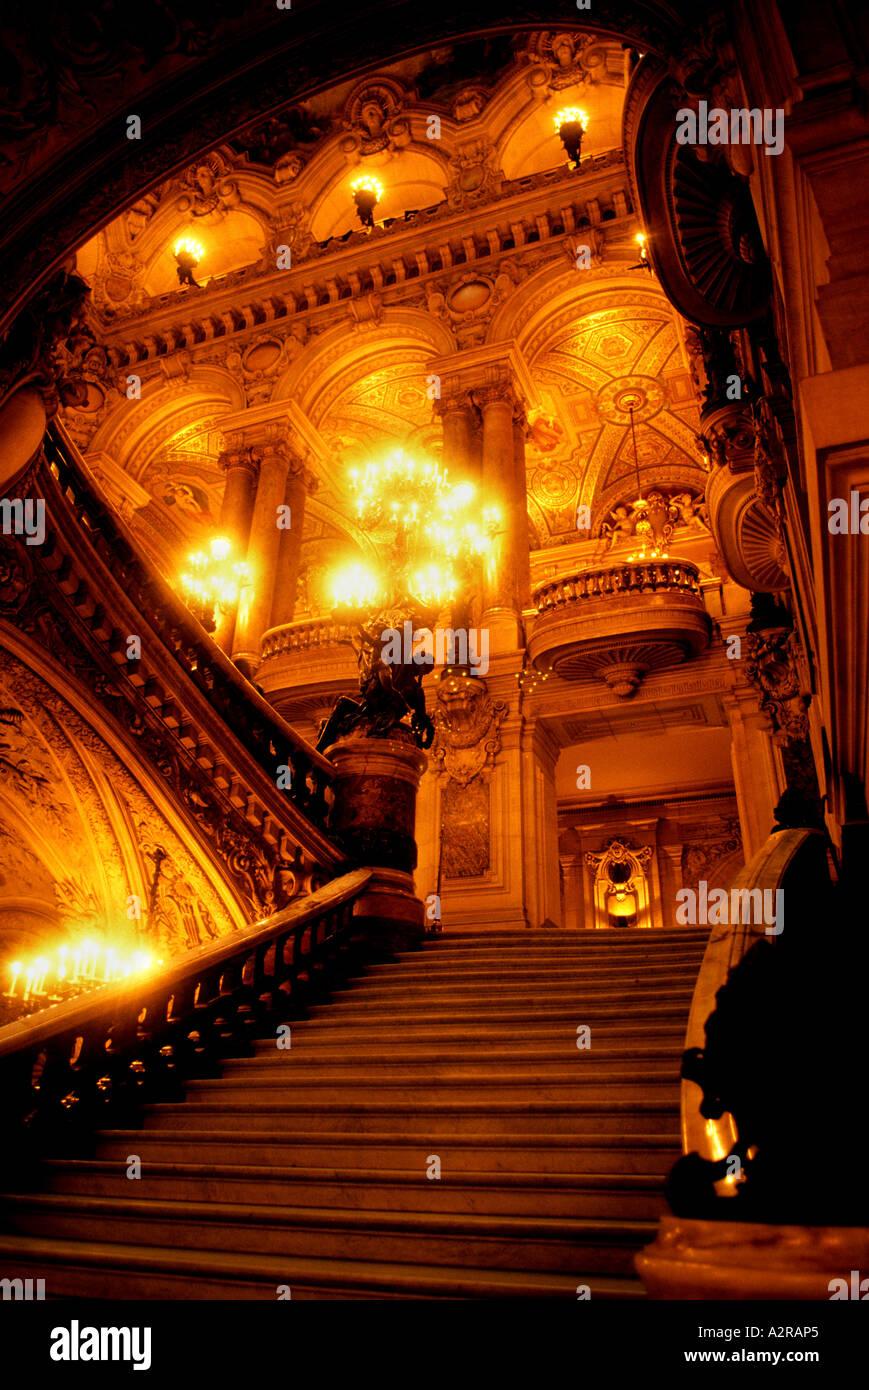 Opera Paris The Palais Garnier music dance theatre  lyric ballet performance show sensuality - Stock Image